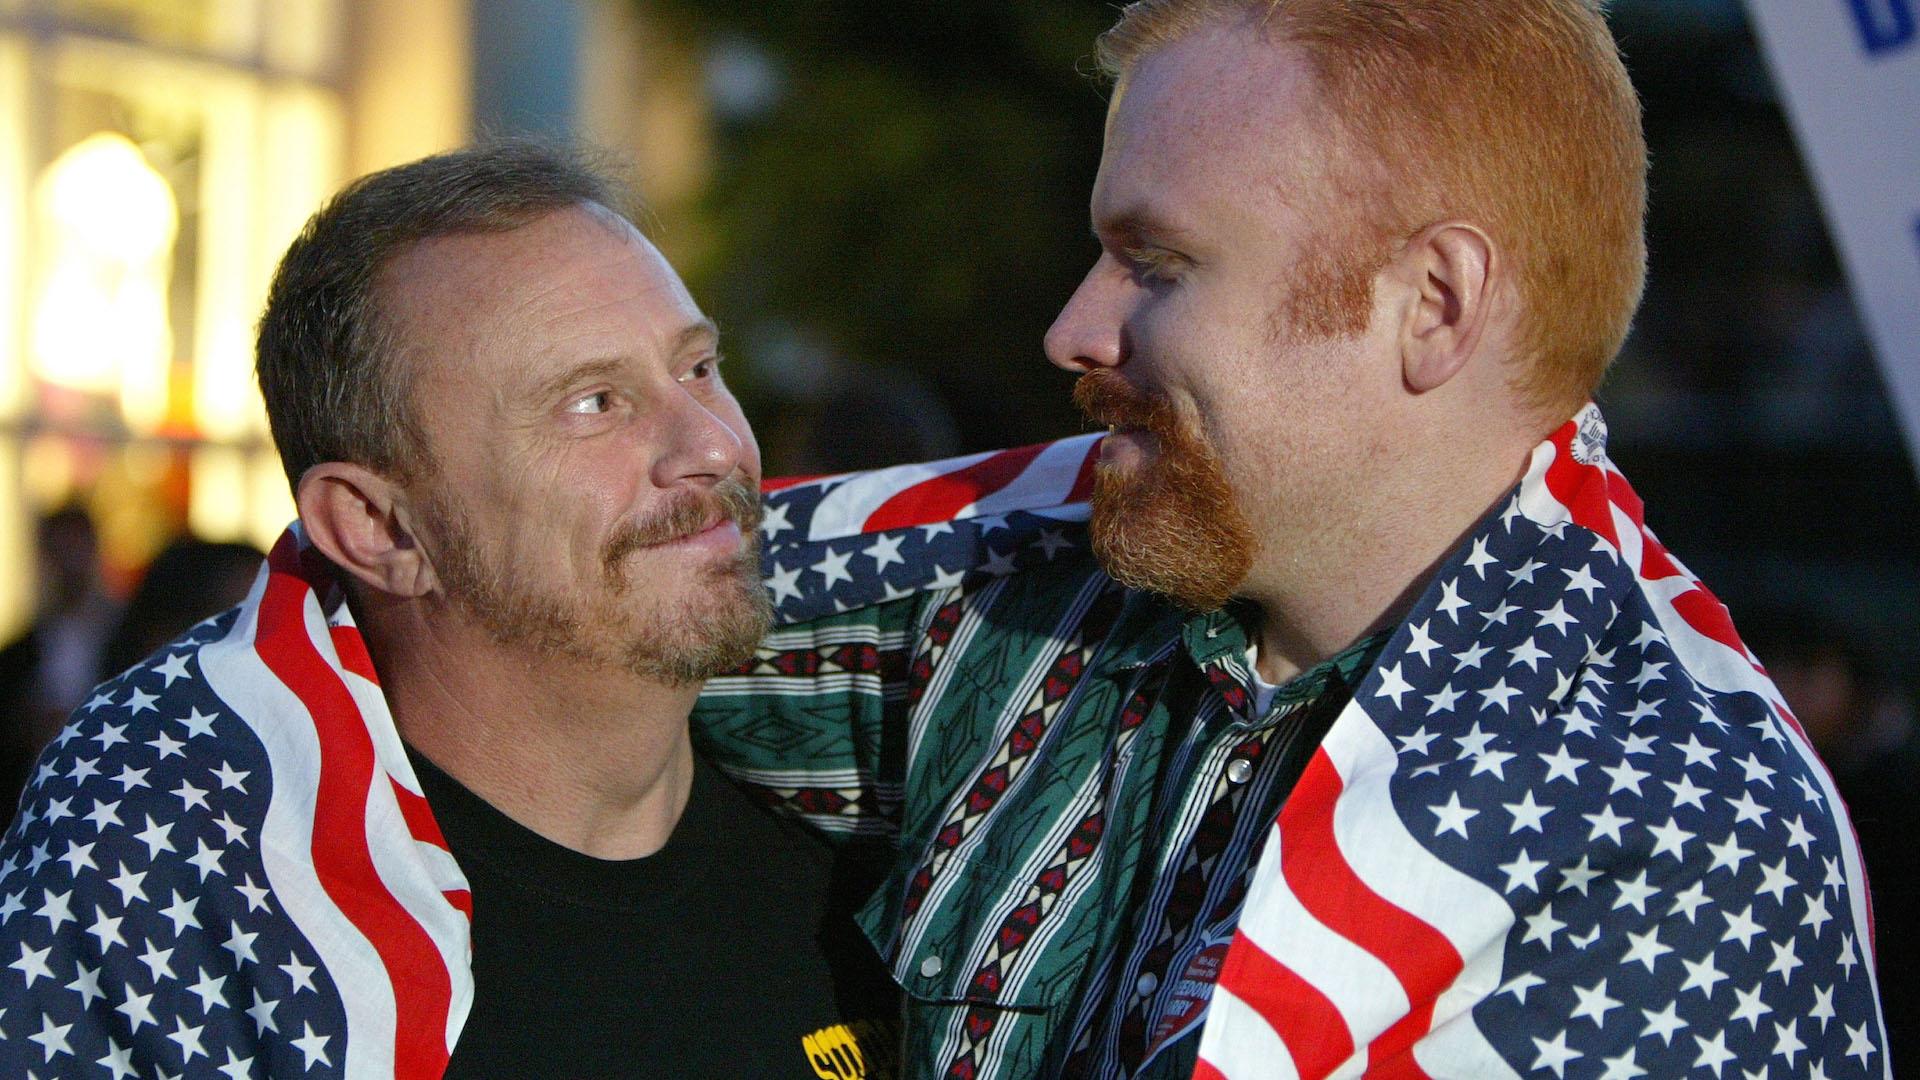 episcopal church gay marriage